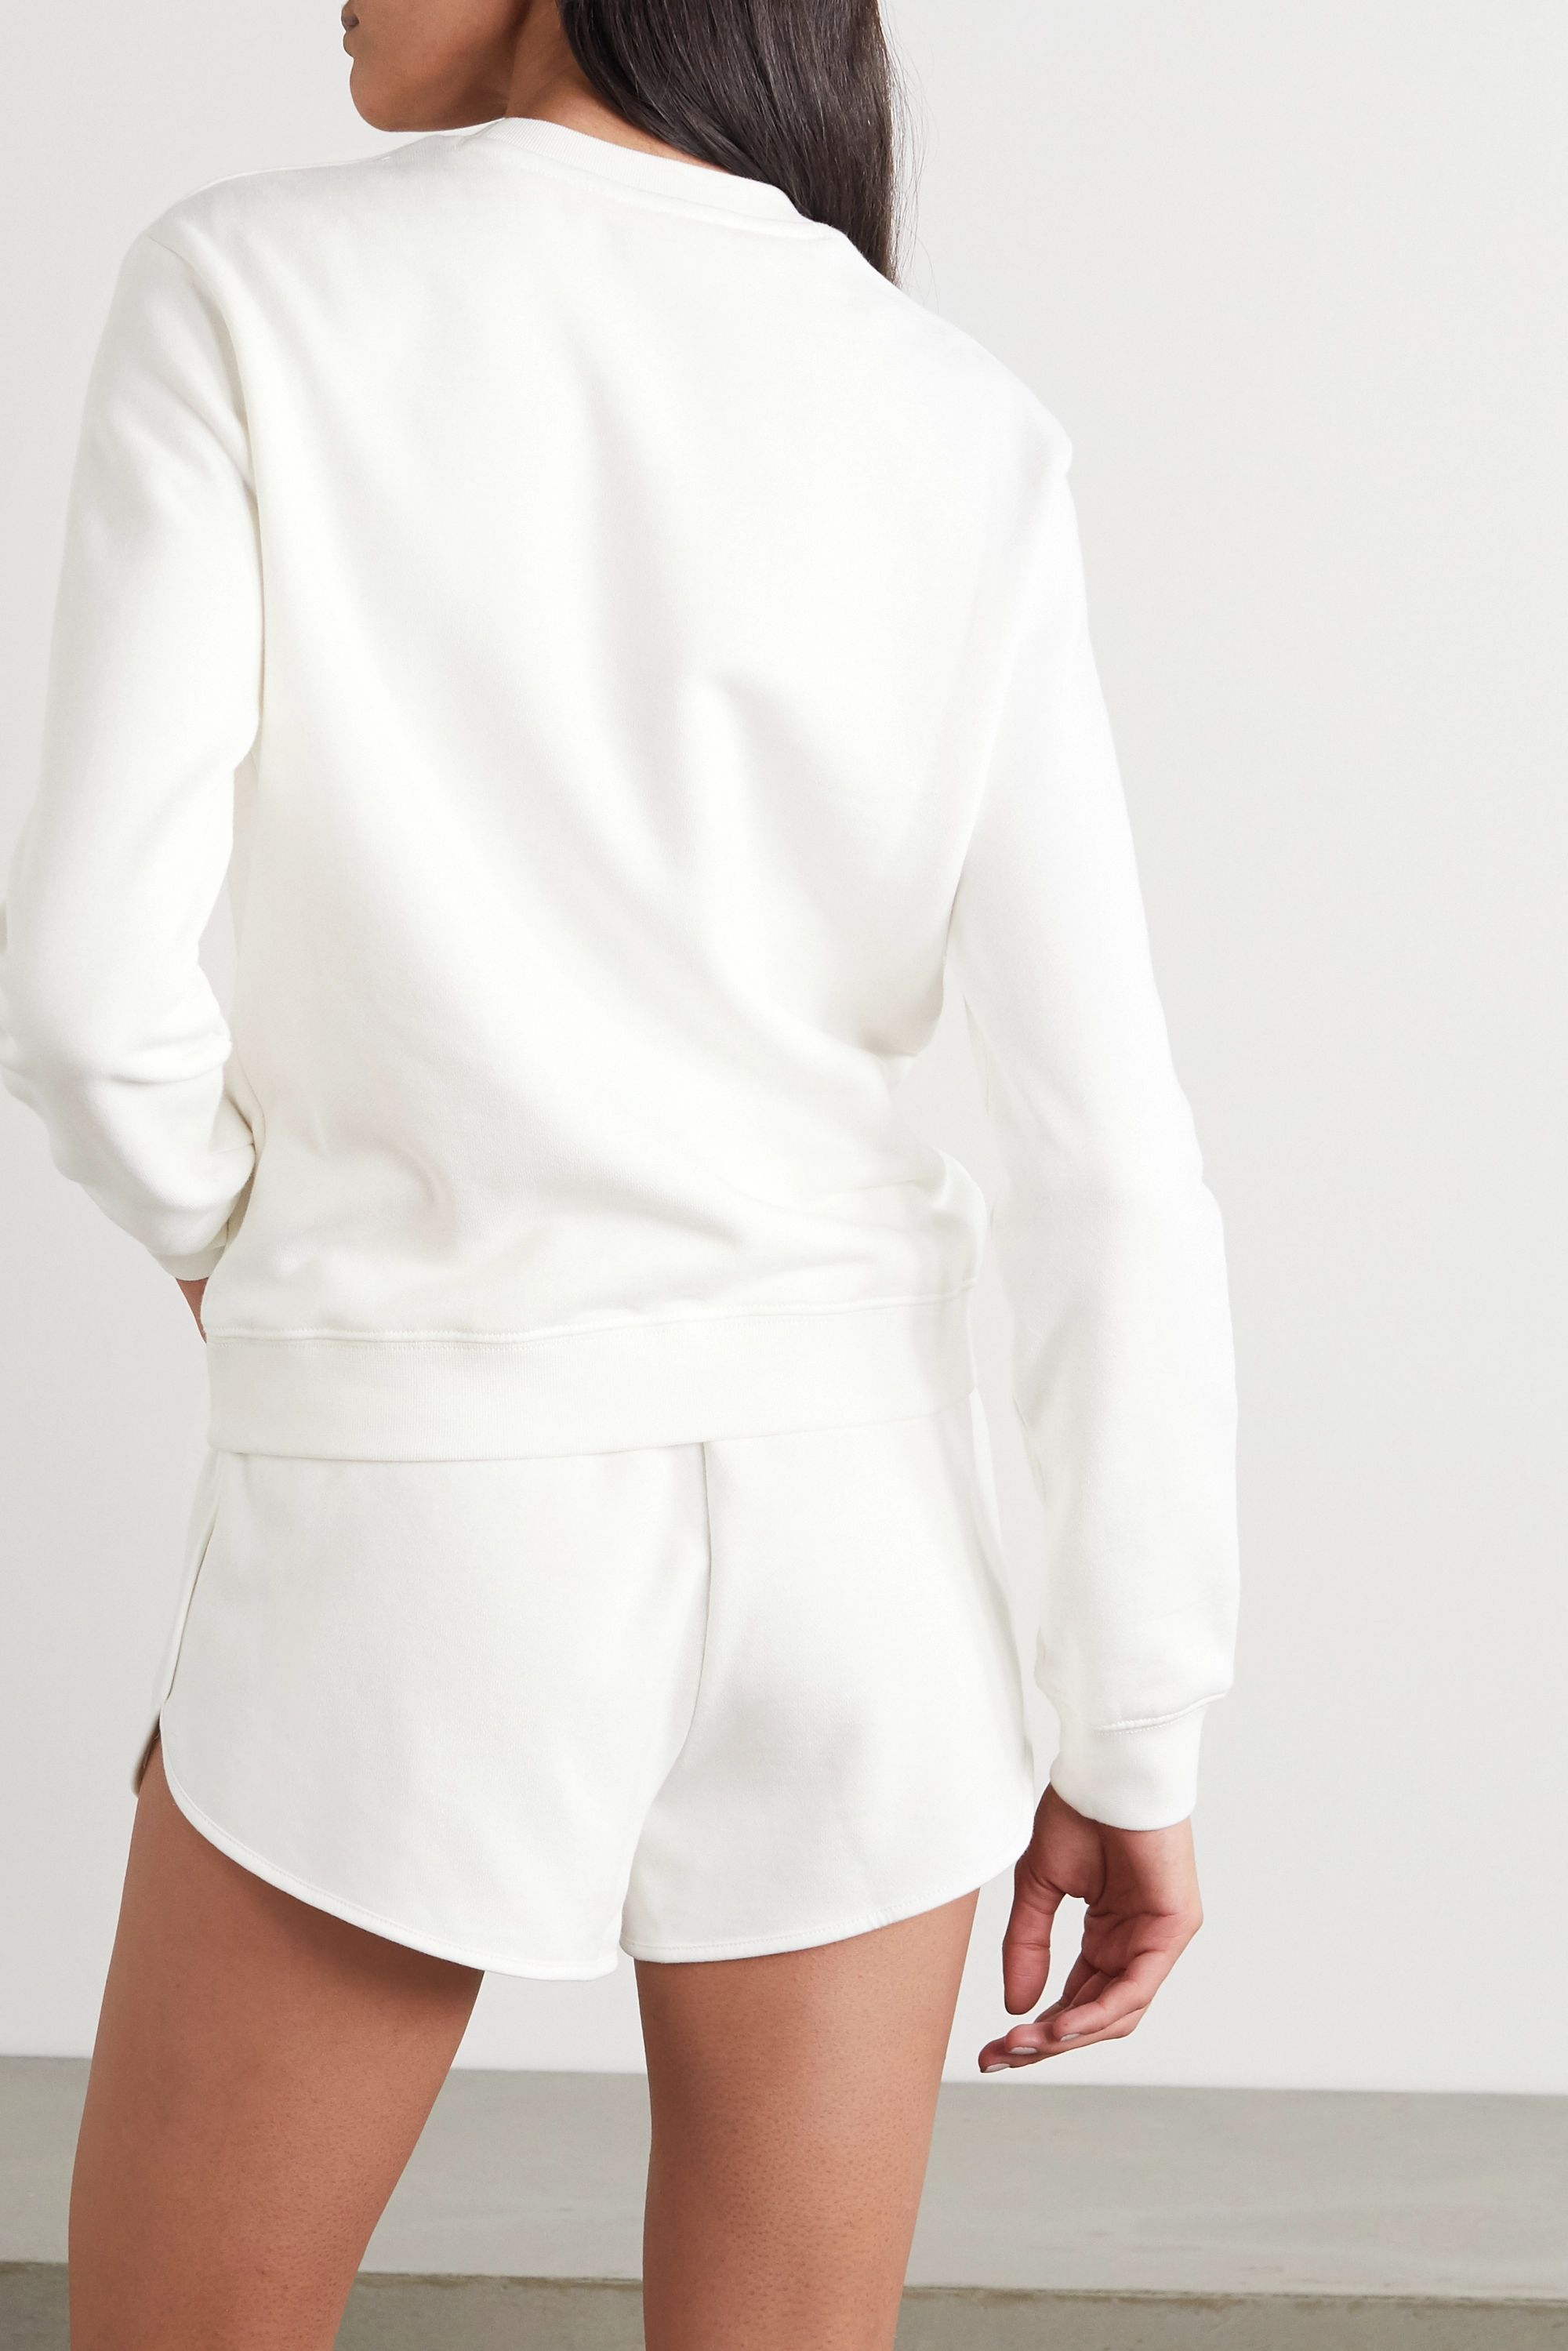 Ninety Percent 【NET SUSTAIN】Stephanie 有机纯棉平纹布卫衣